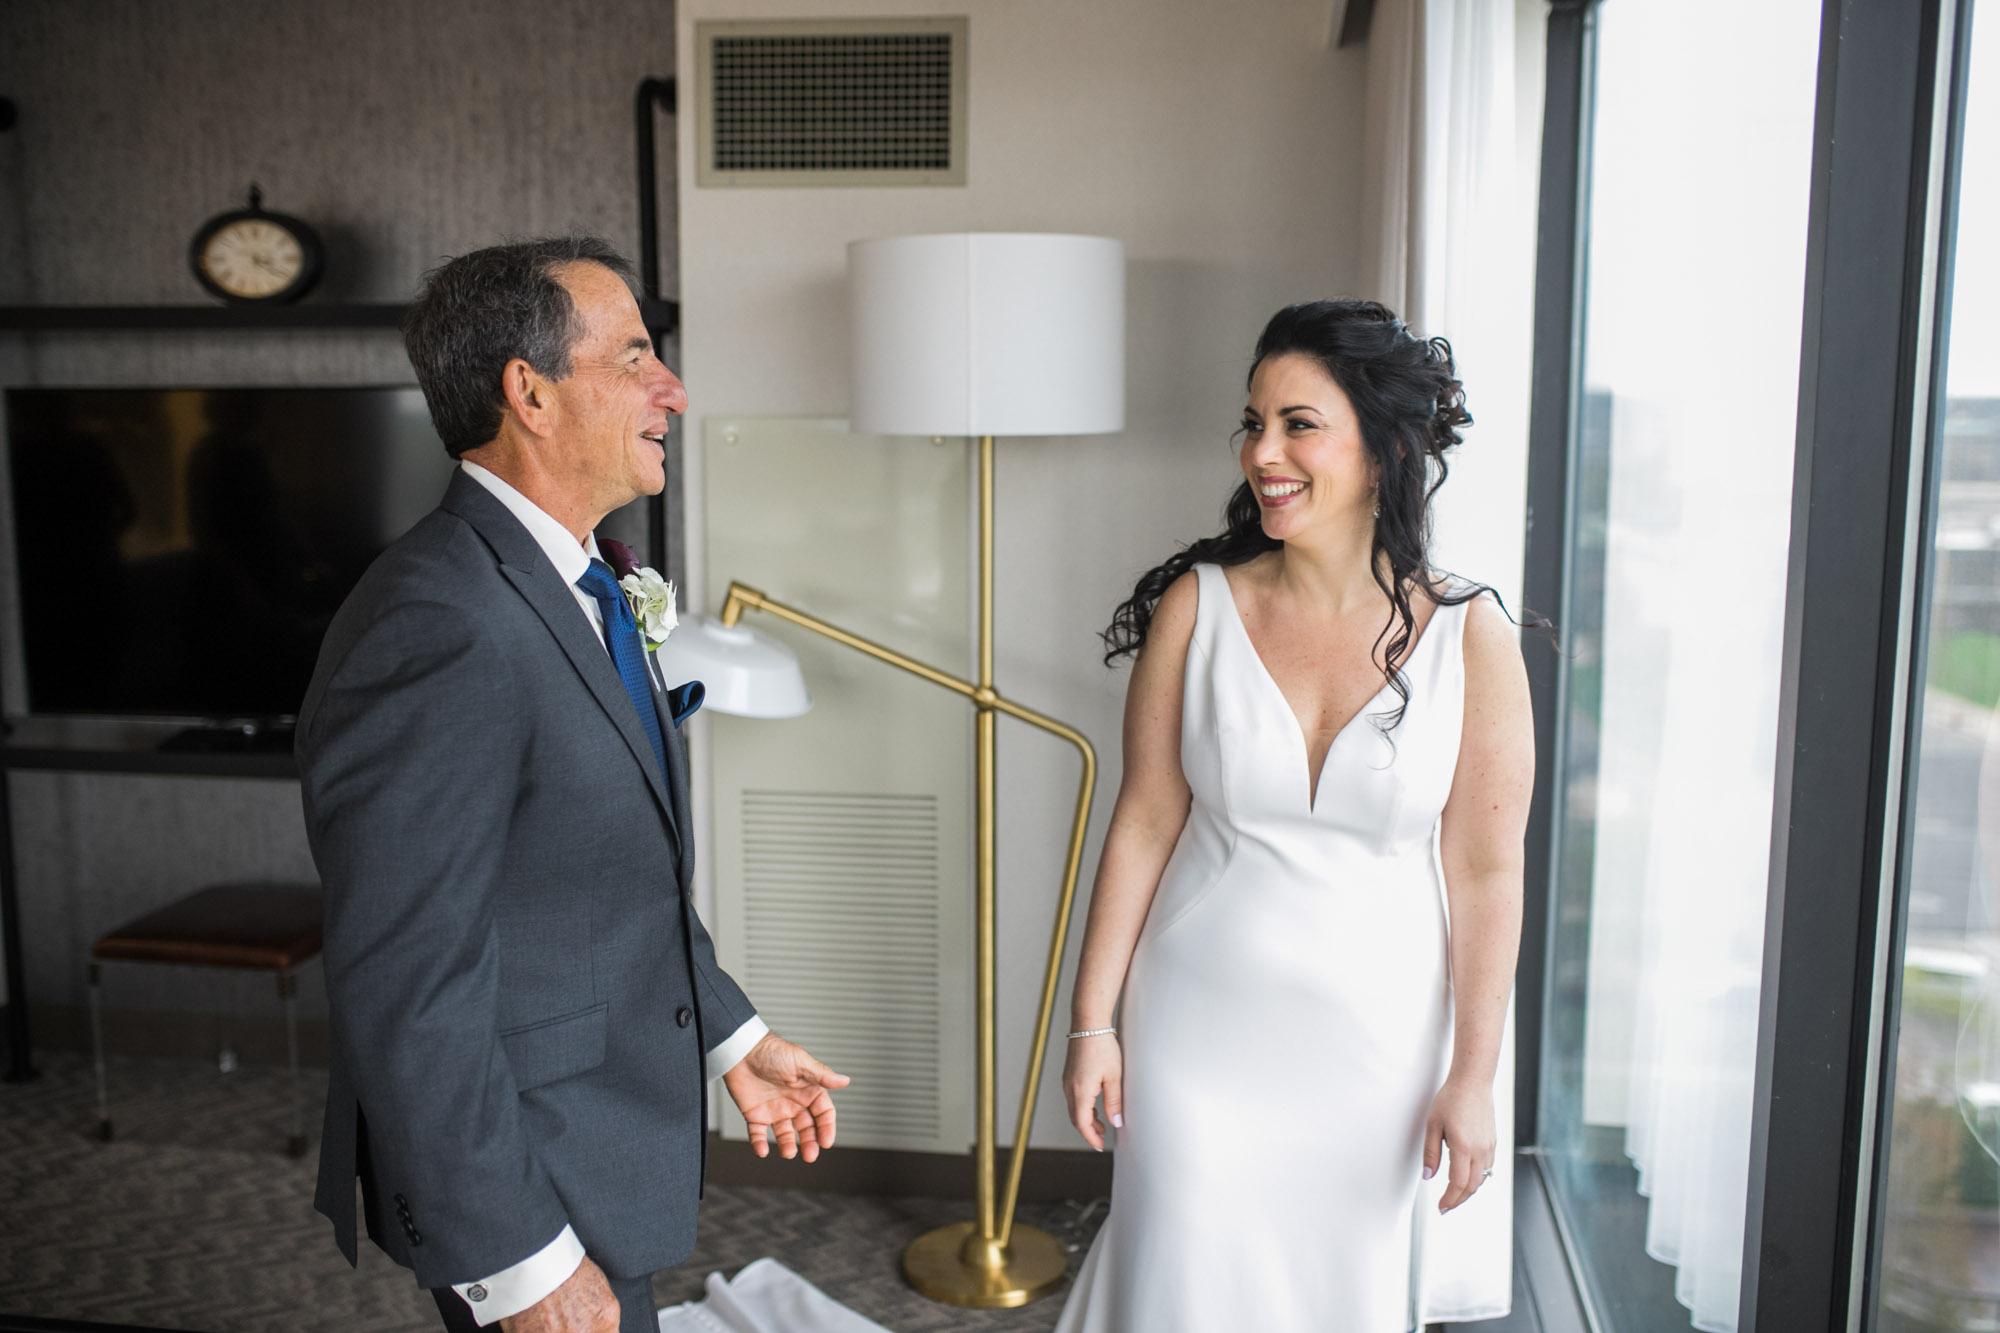 renaissance-hotel-toledo-wedding-23.jpg